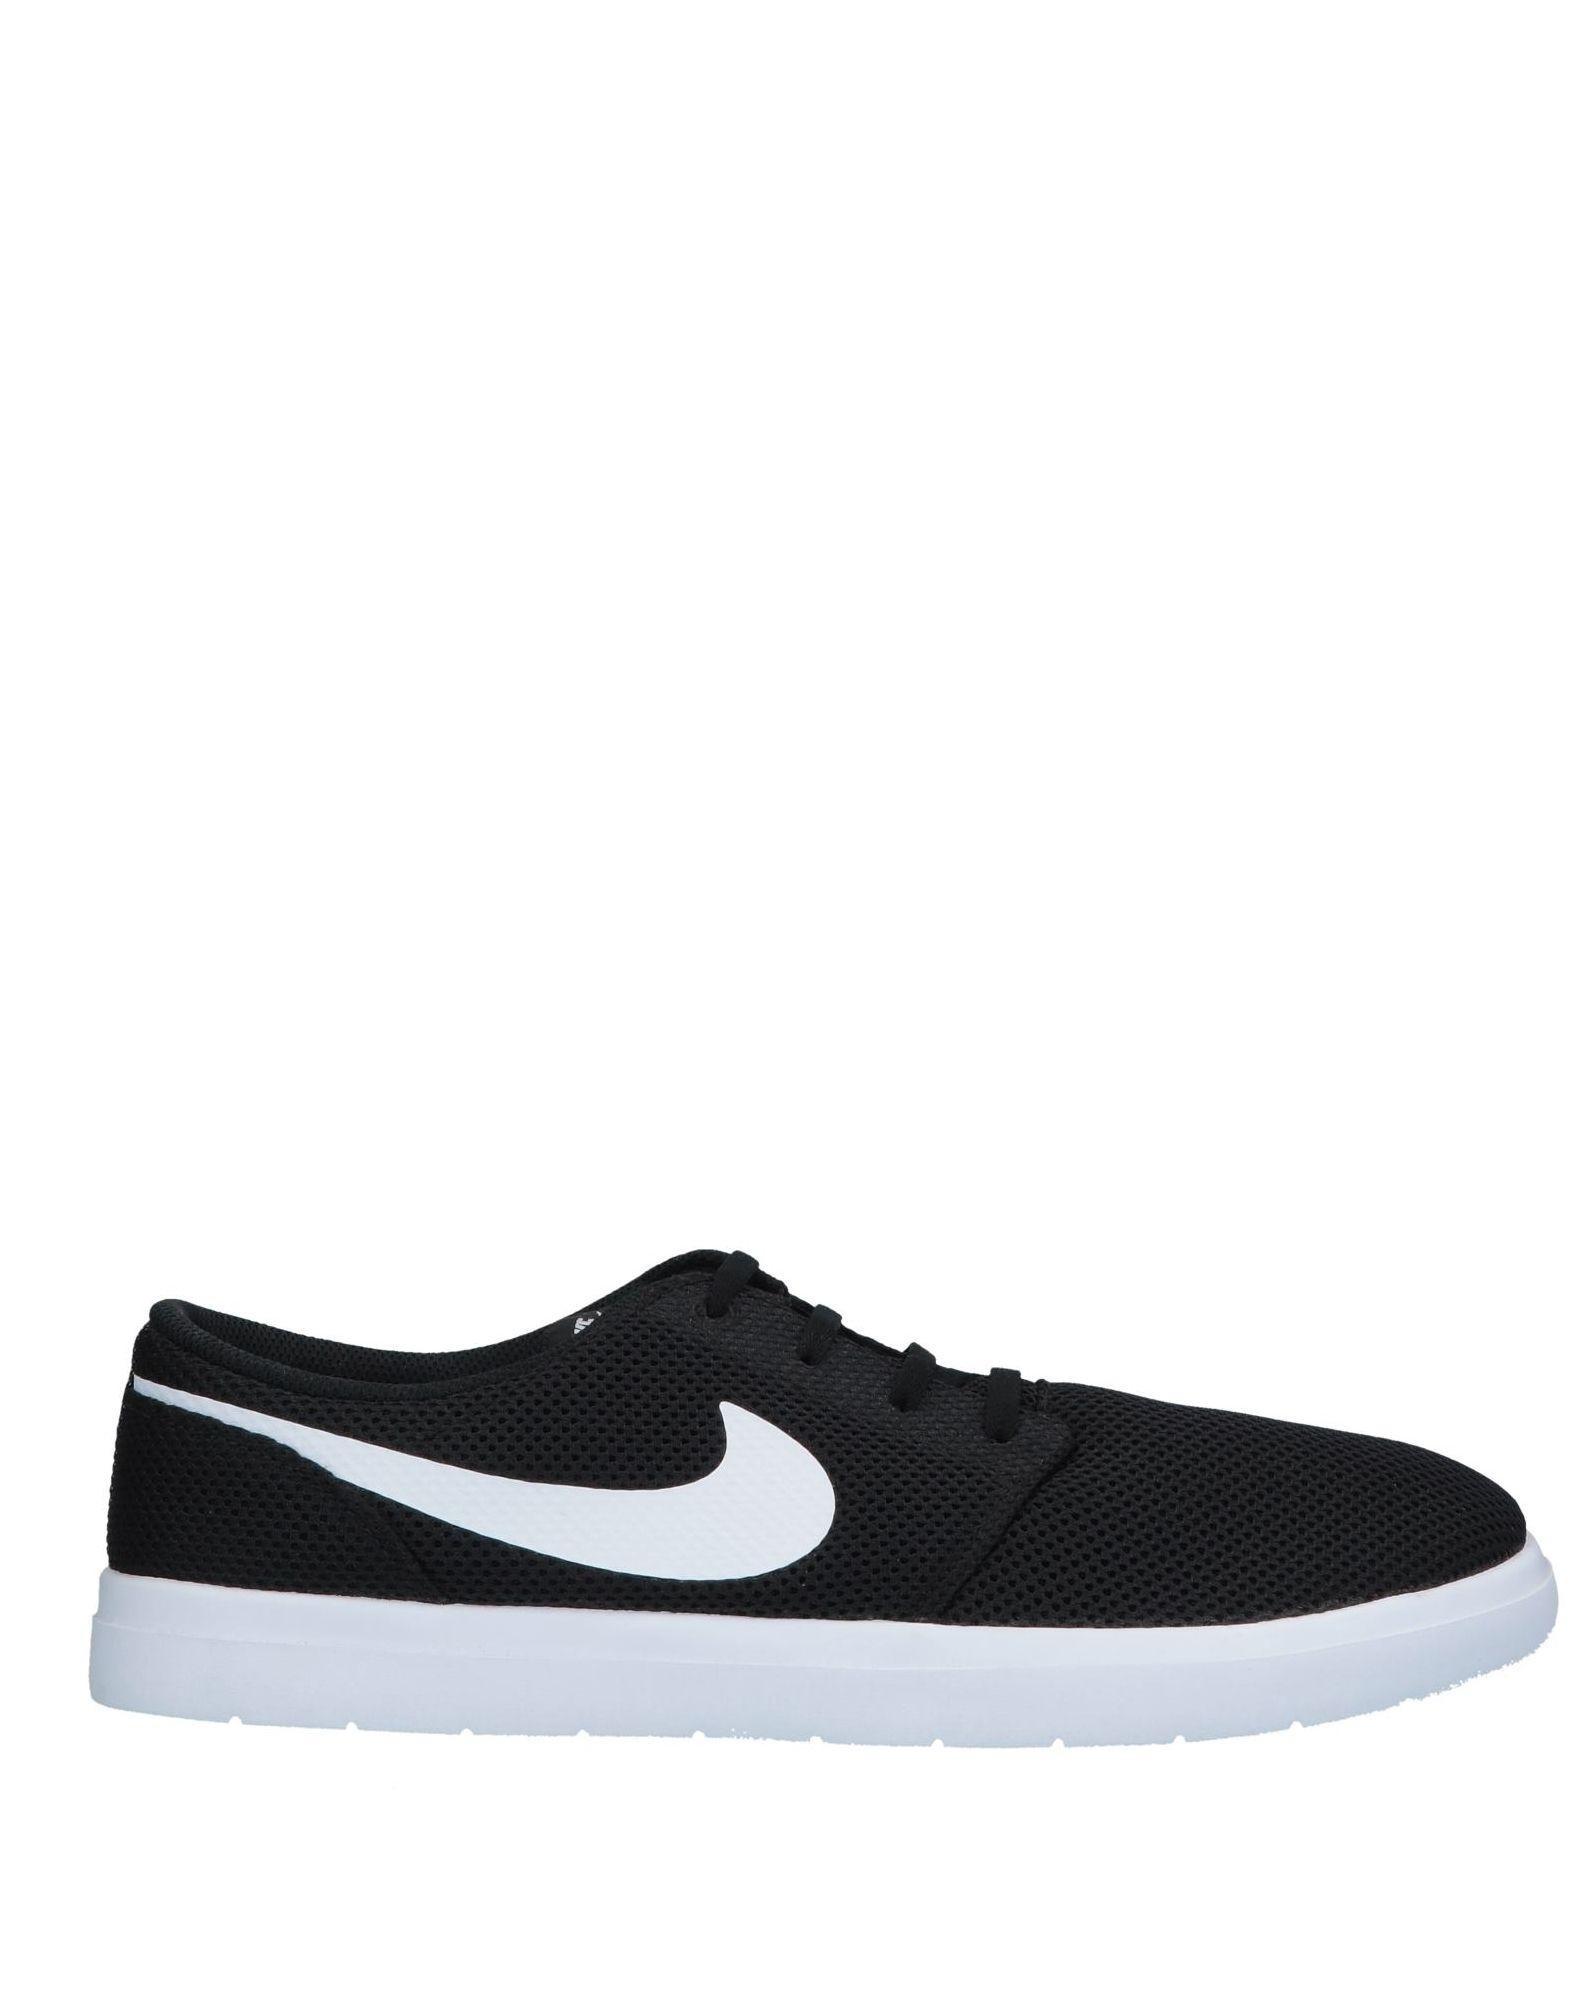 Turnschuhe Nike Sb Collection herren - 11700745ME